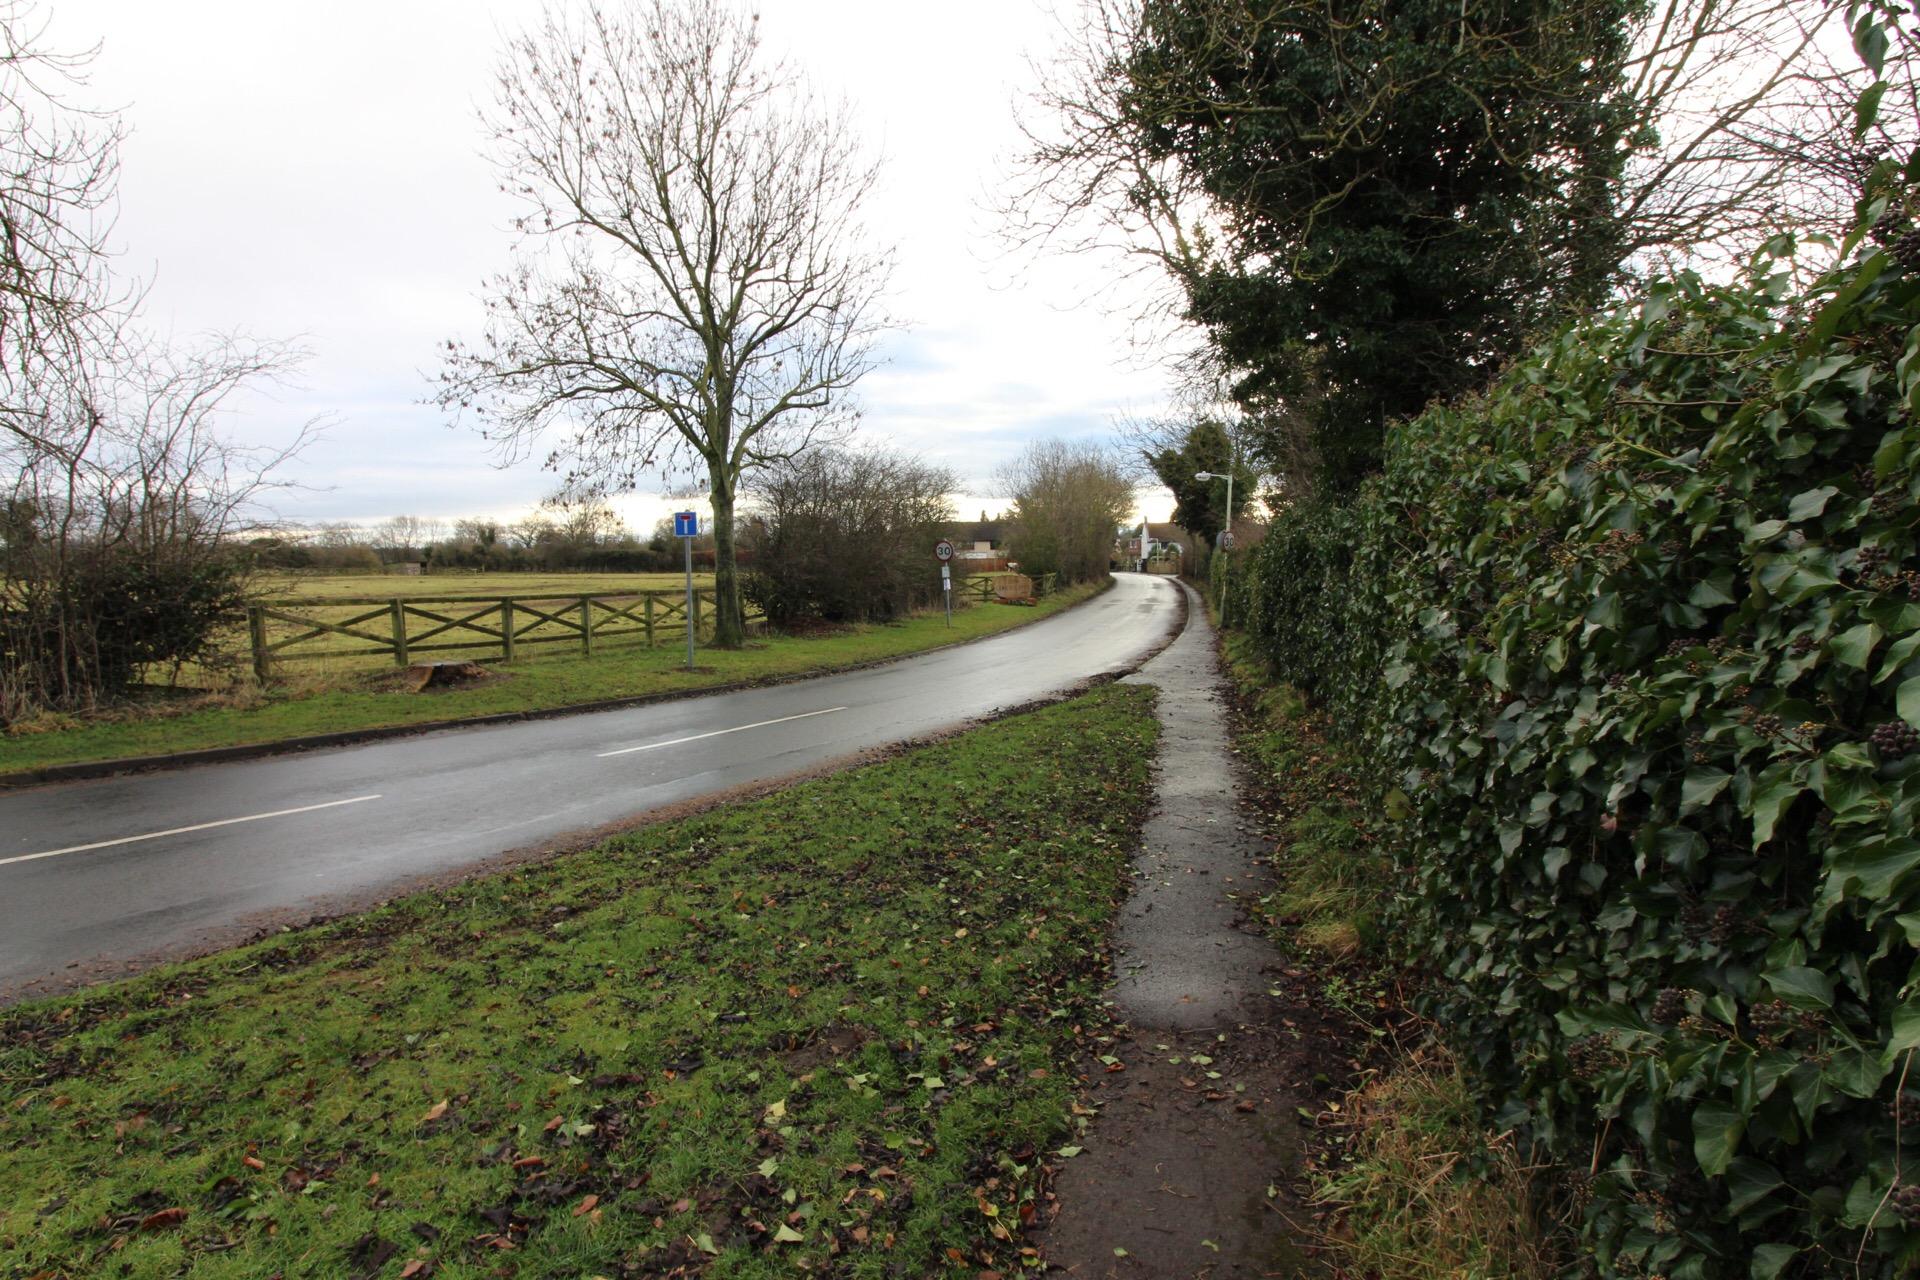 Road into Low Coniscliffe